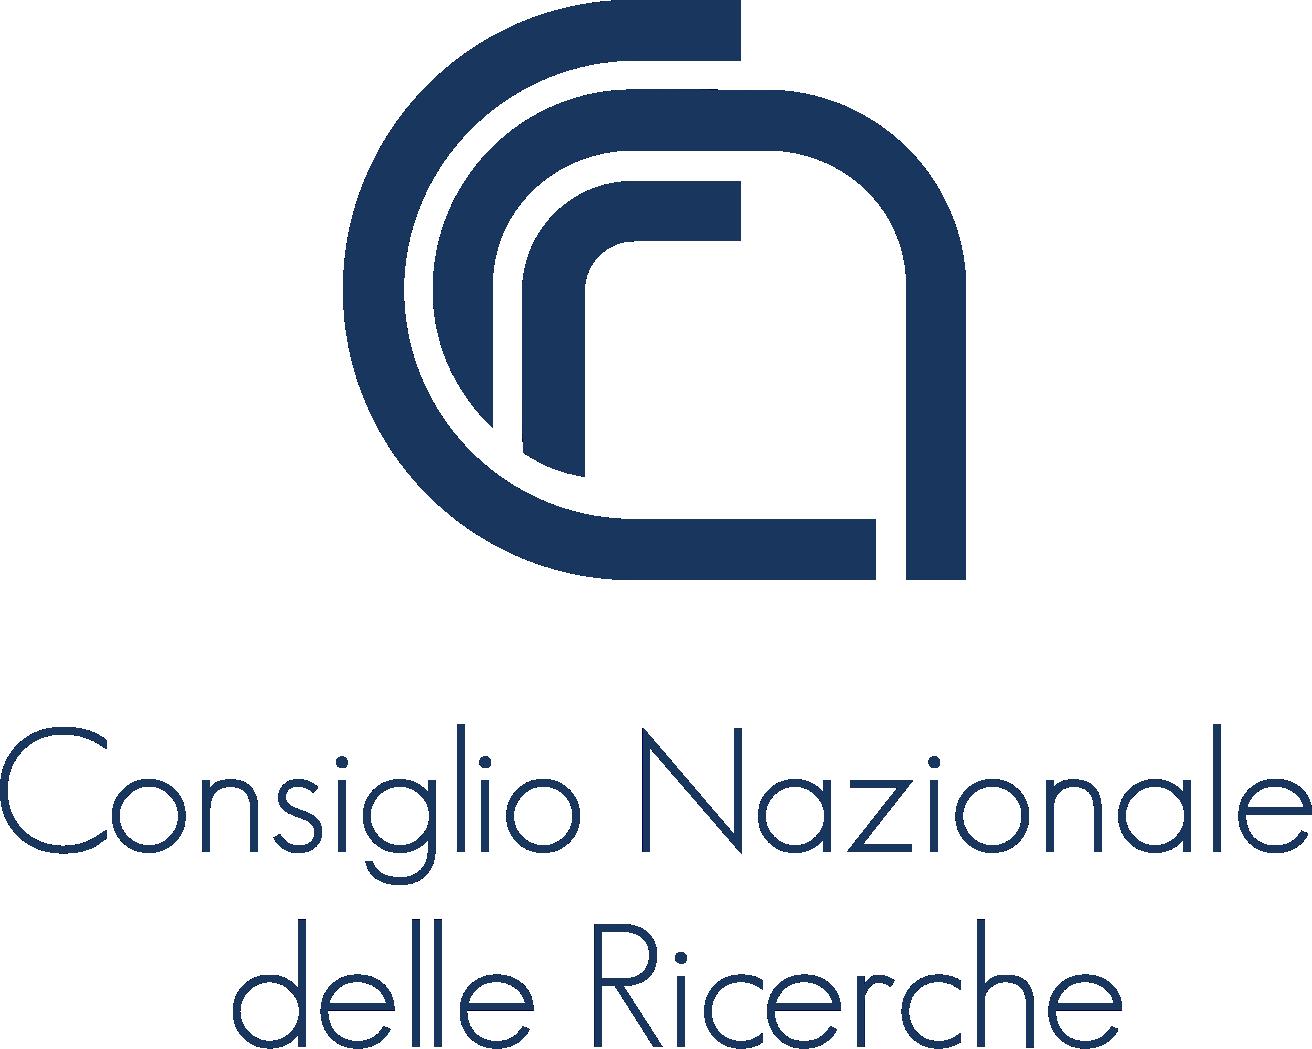 Cnr - Istituto di Biofisica (IBF)